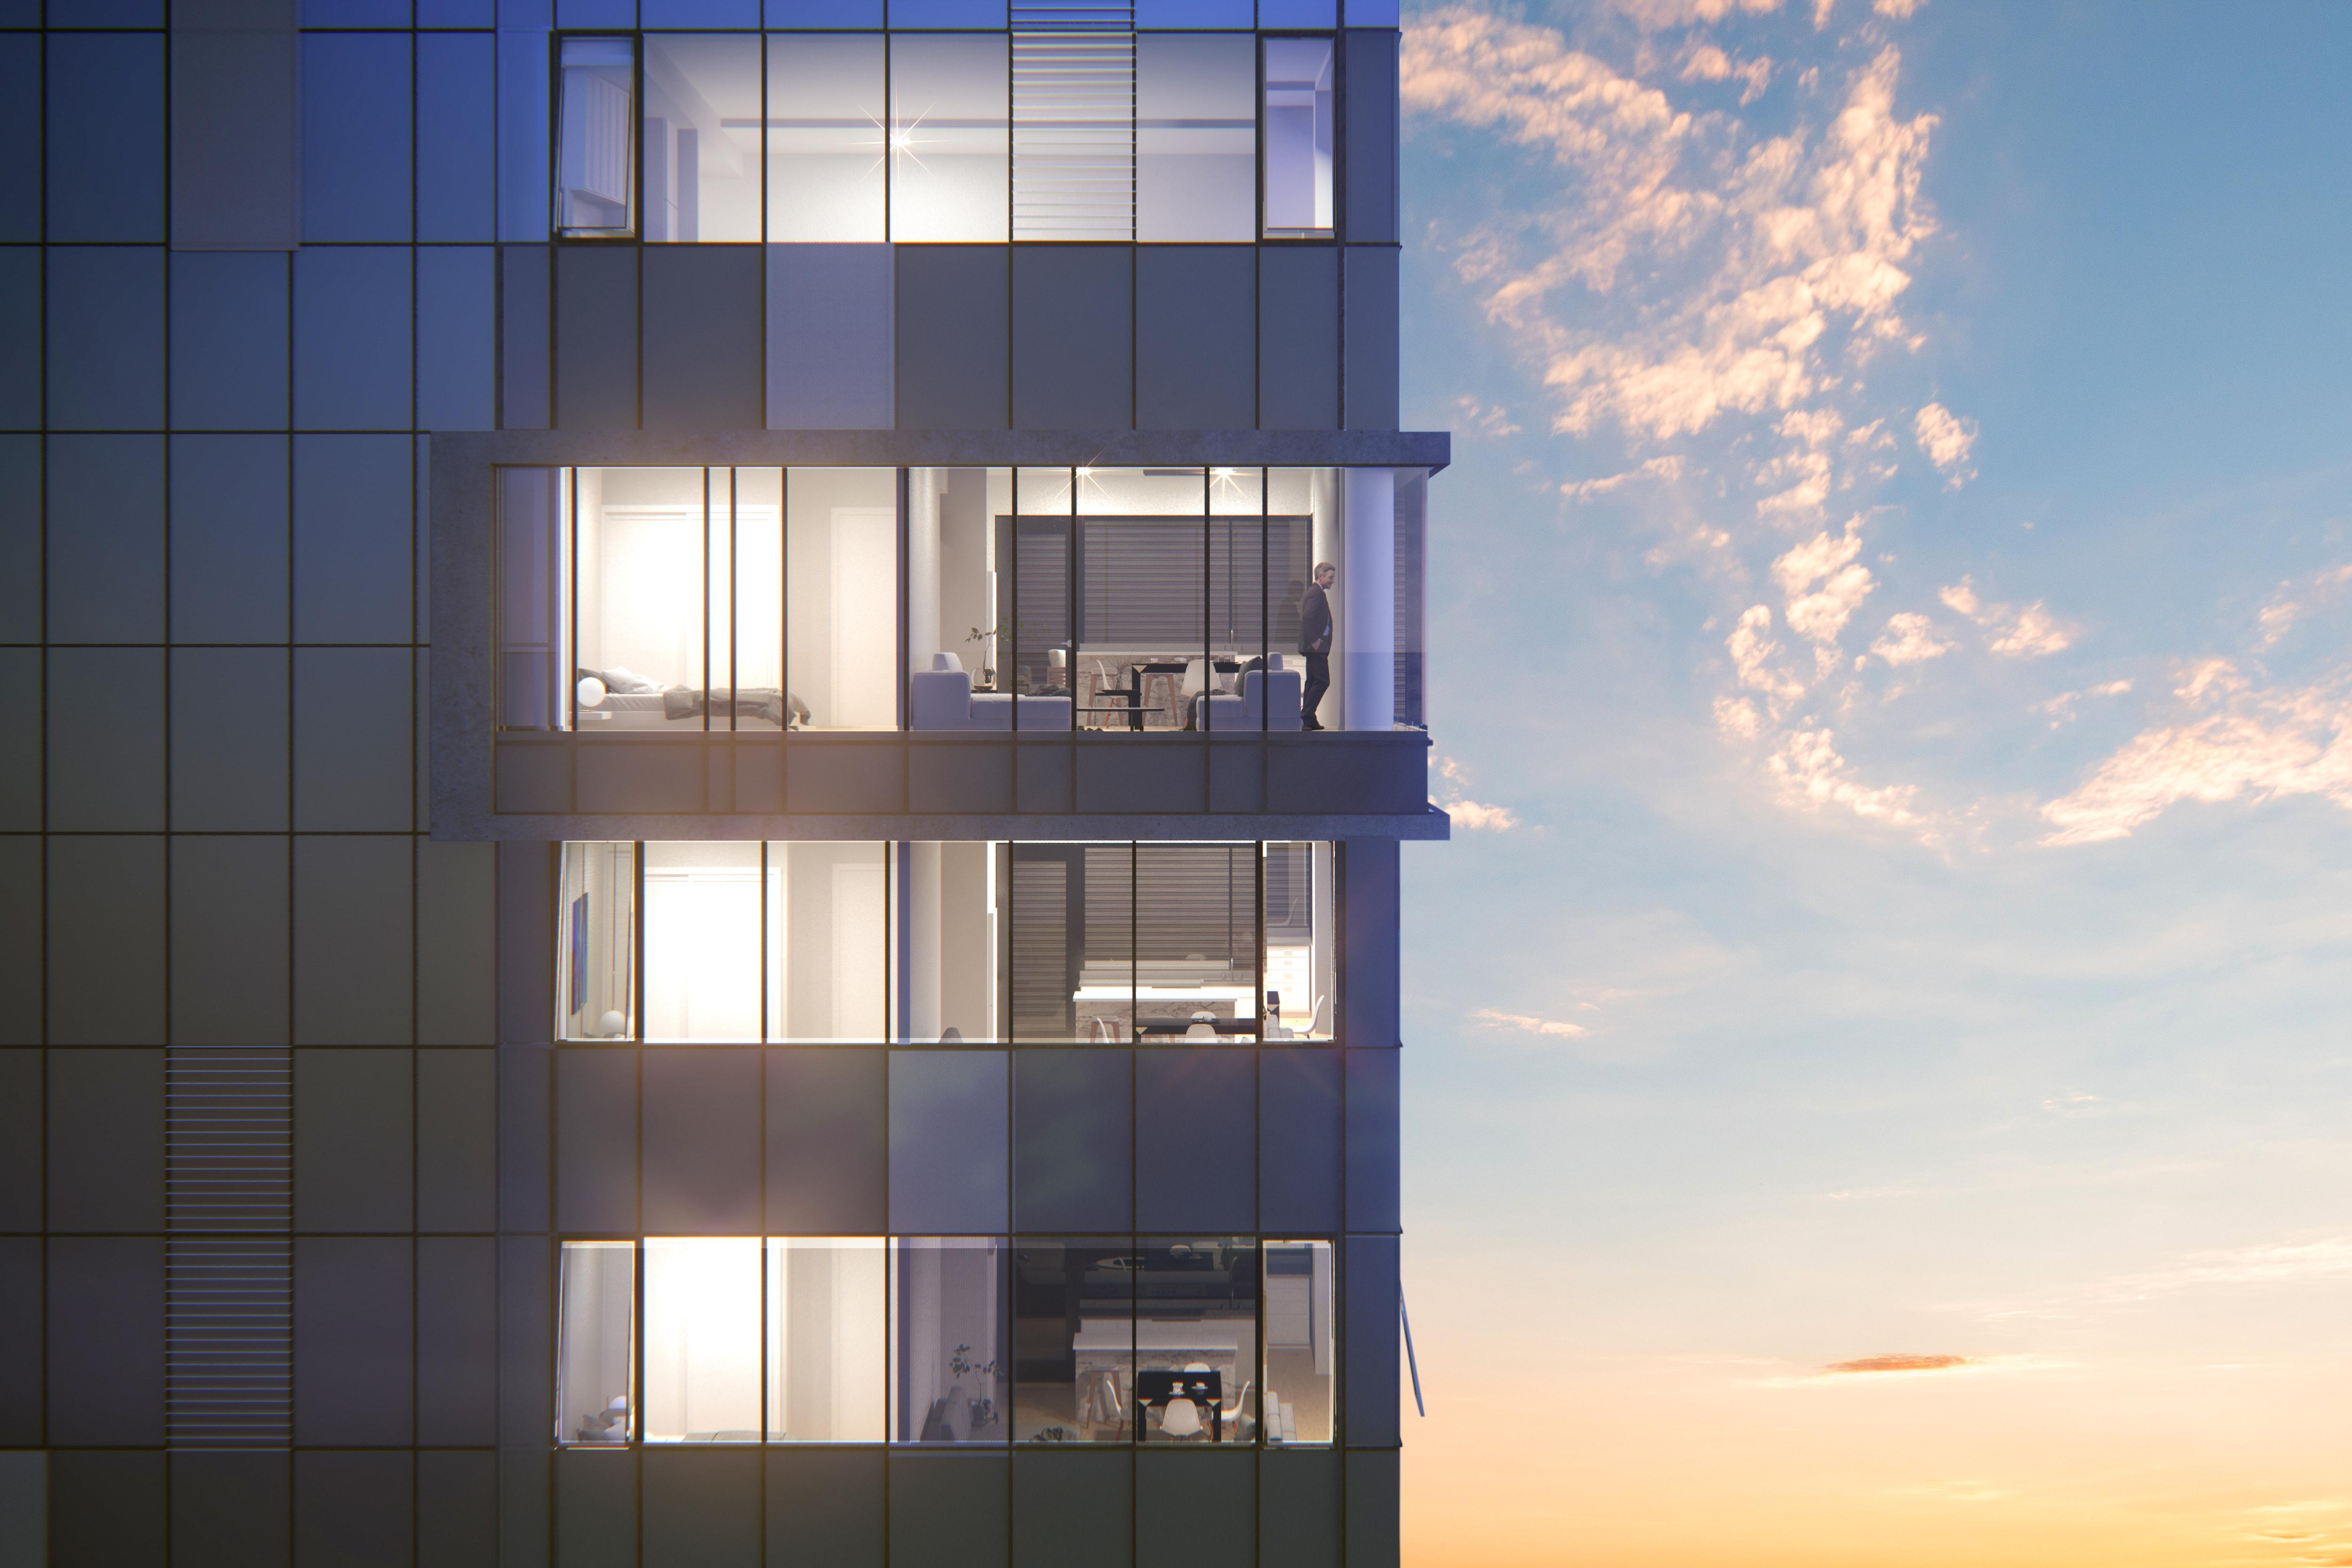 '388 Cordova' by Adept Development in Los Angeles